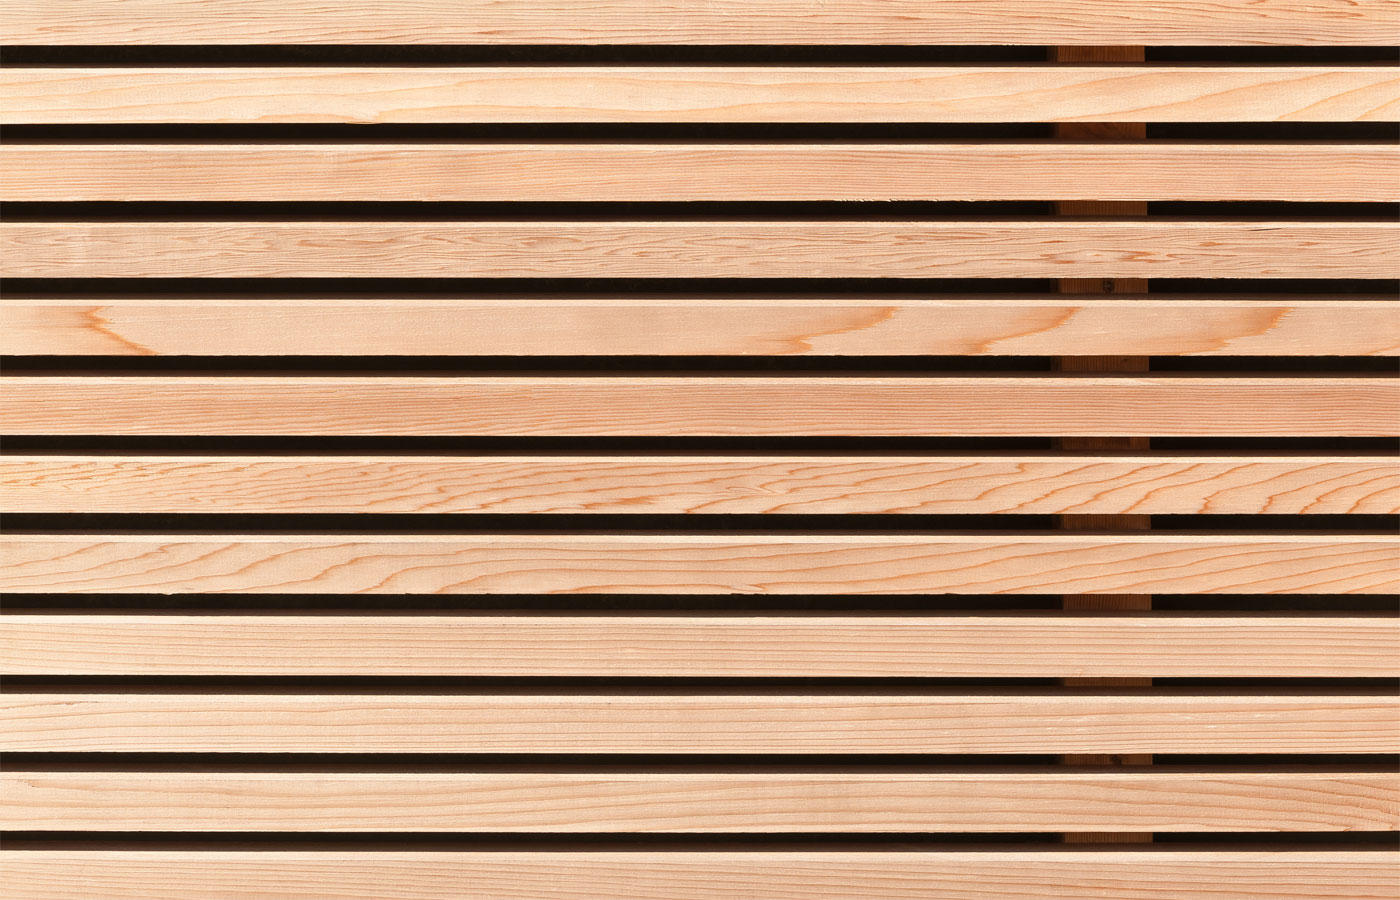 Wooden Cladding Horizontal ~ Büeli holzverarbeitung ag roland griesser zürich